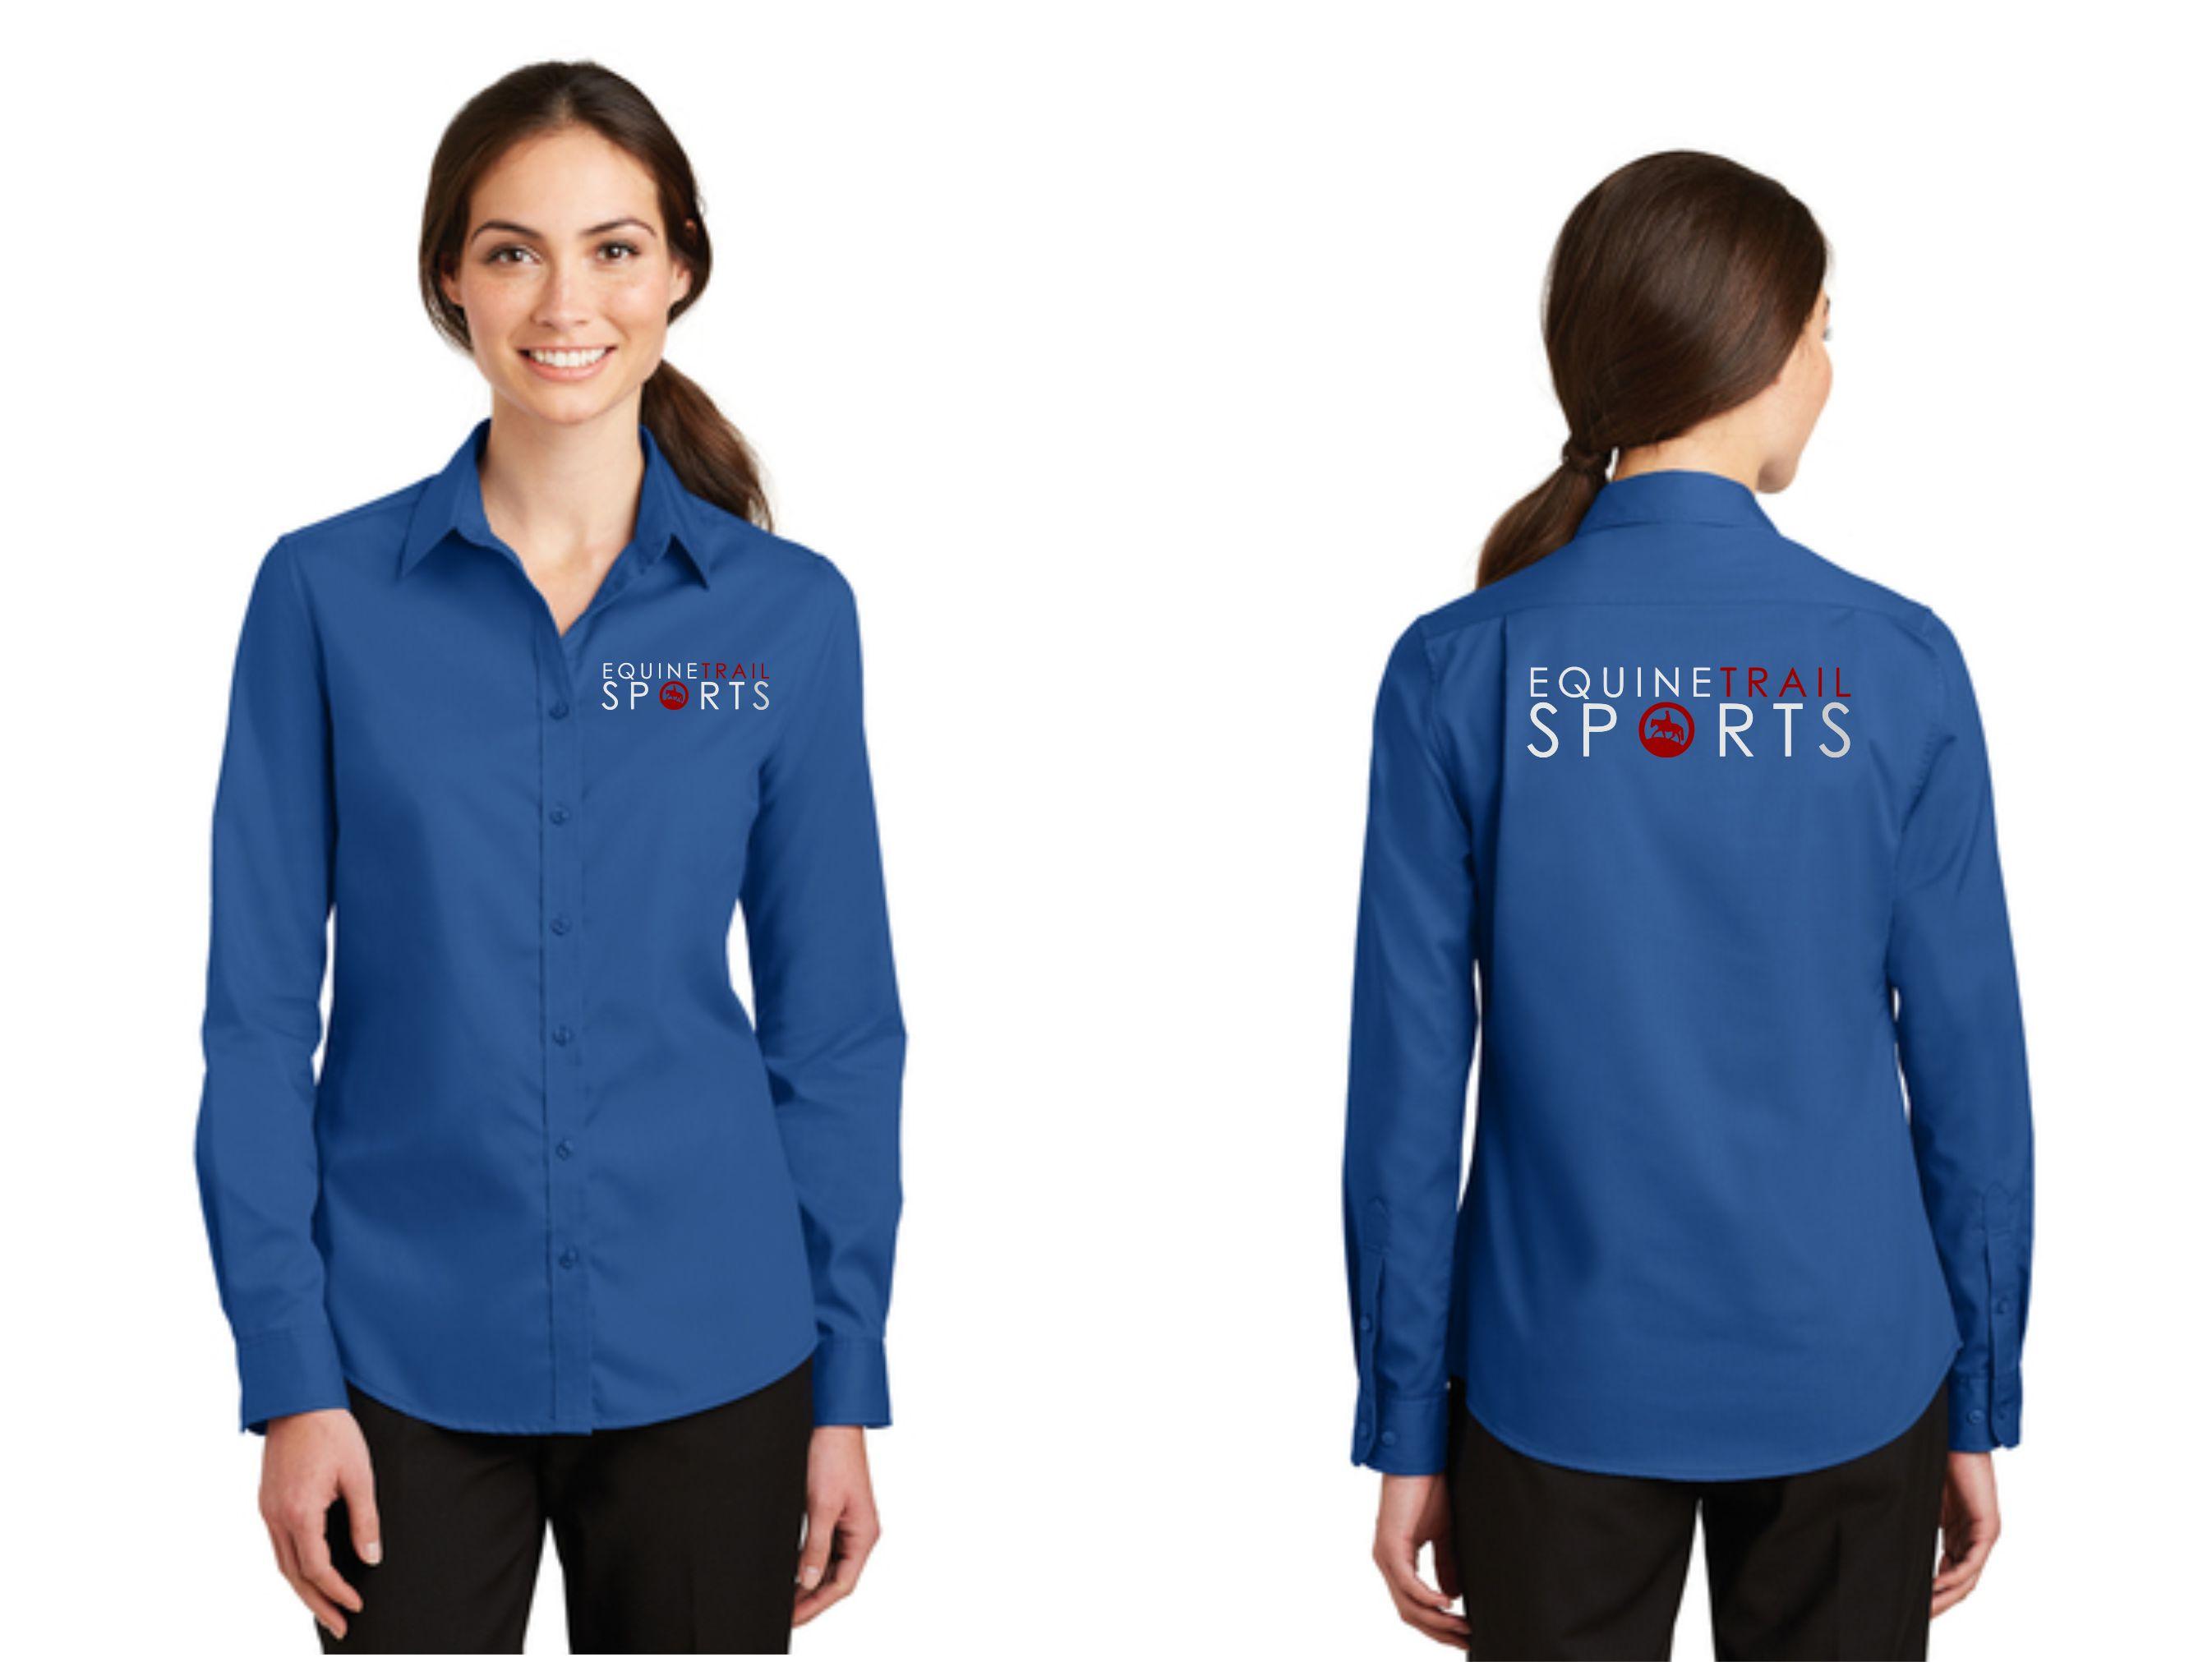 49e4416f2  42 Women s Embroidered Shirt Port Authority SuperPro Twill Shirt - L663  Royal